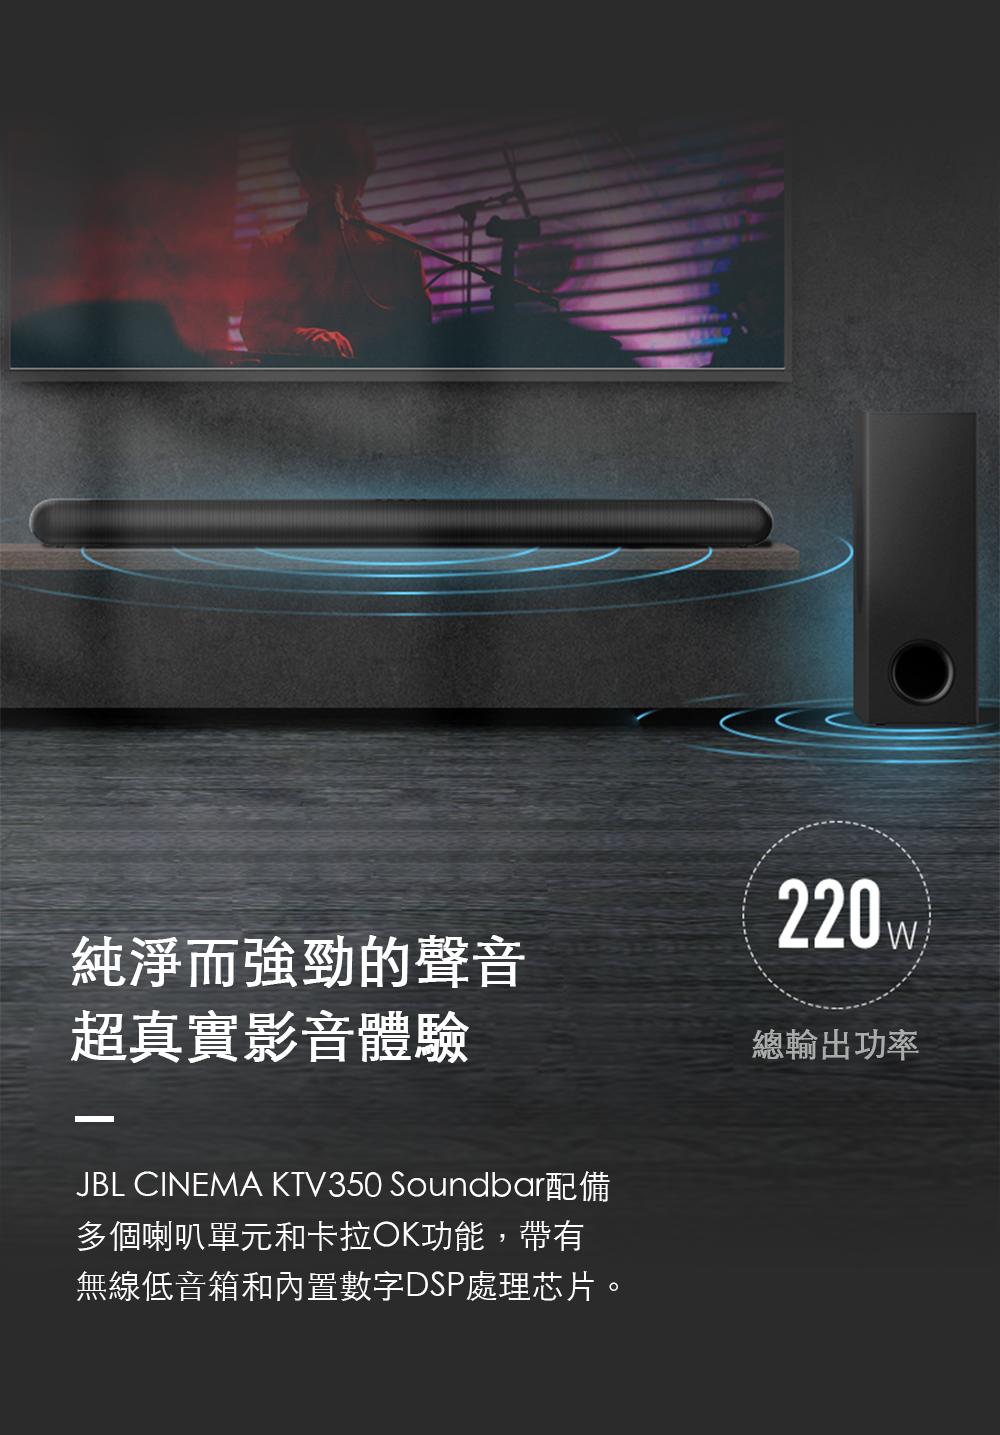 JBL-CINEMA-KTV350-Catalogue-(繁體中文)4.png